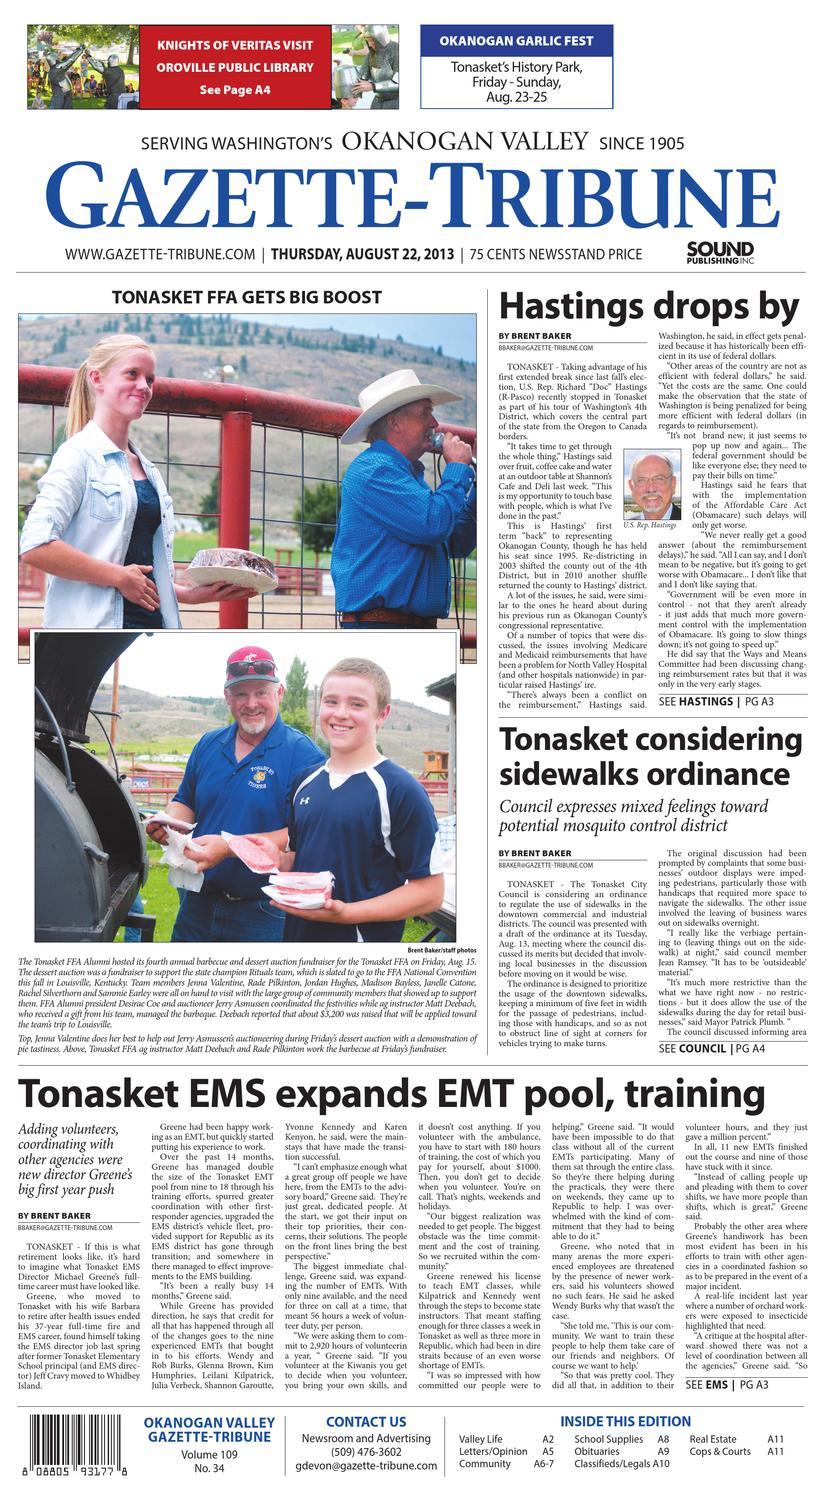 Okanogan Valley Gazette-Tribune, August 22, 2013 by Sound Publishing